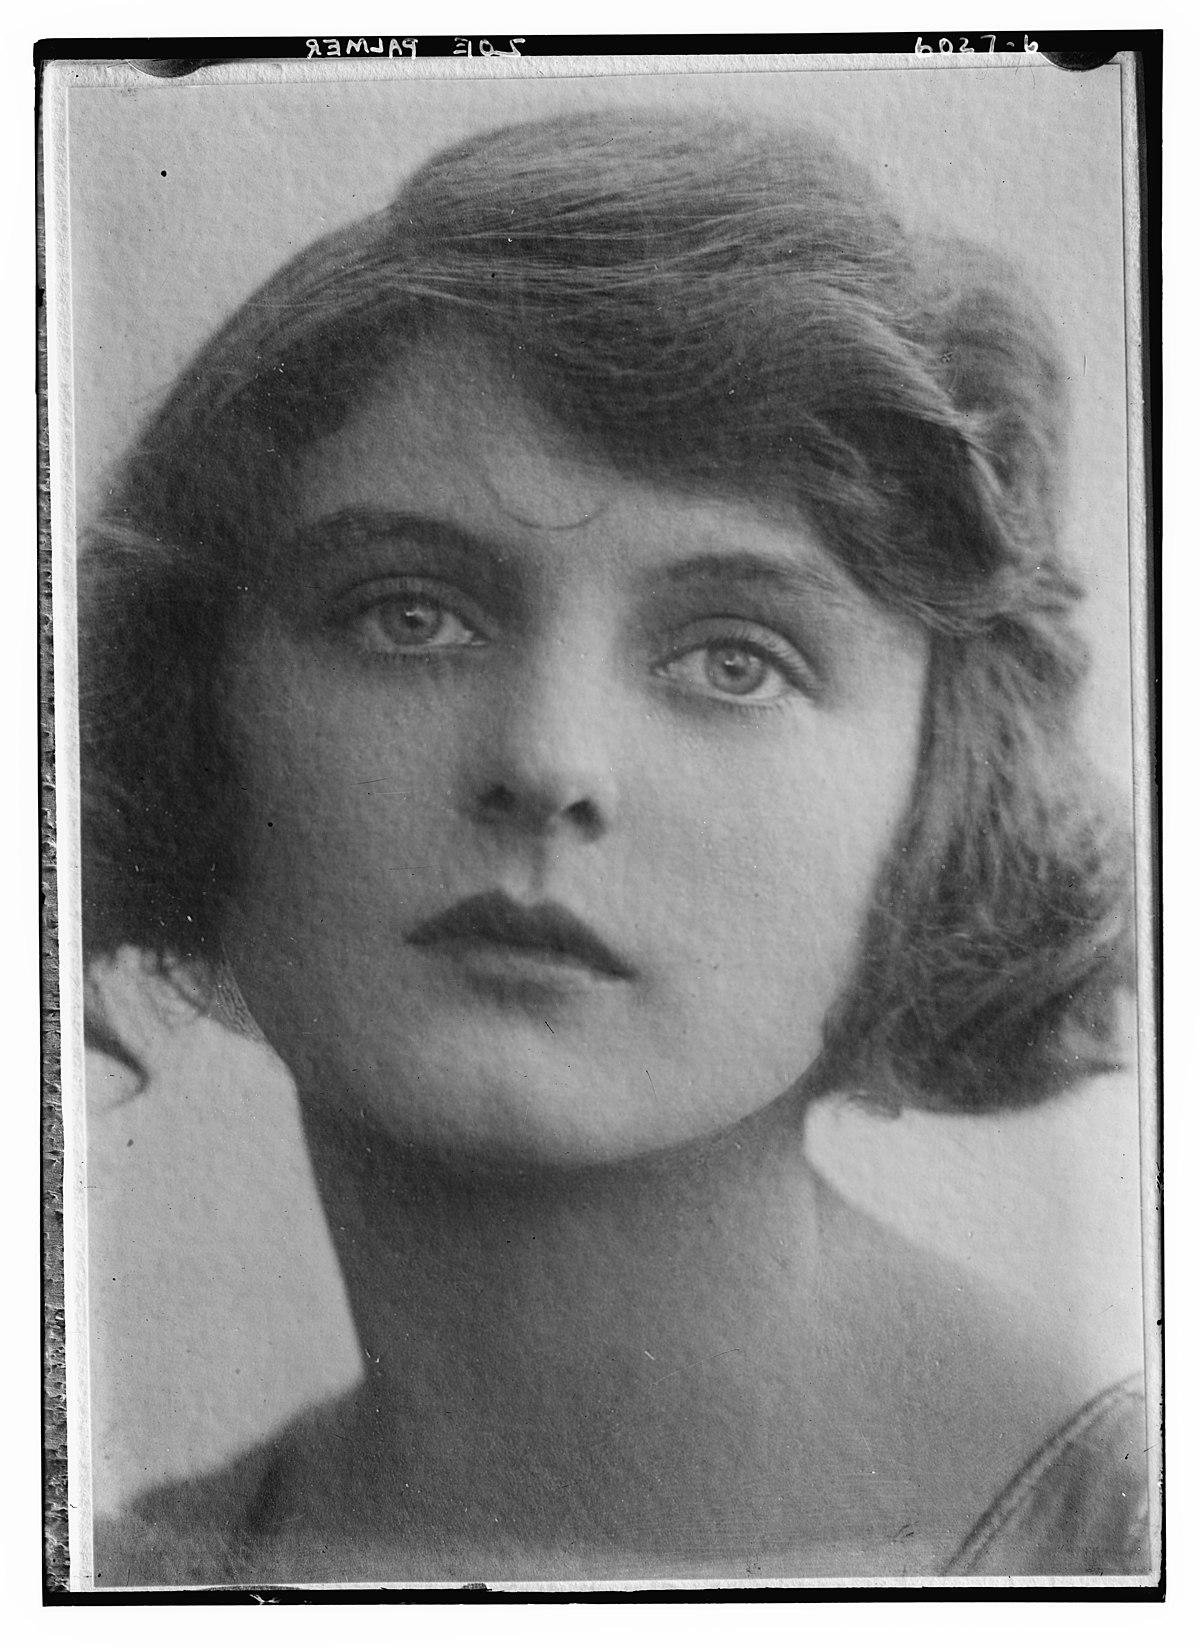 Juanita Jennings,Pearl Mackie Porno archive Anna Thomson,Dorothy Short